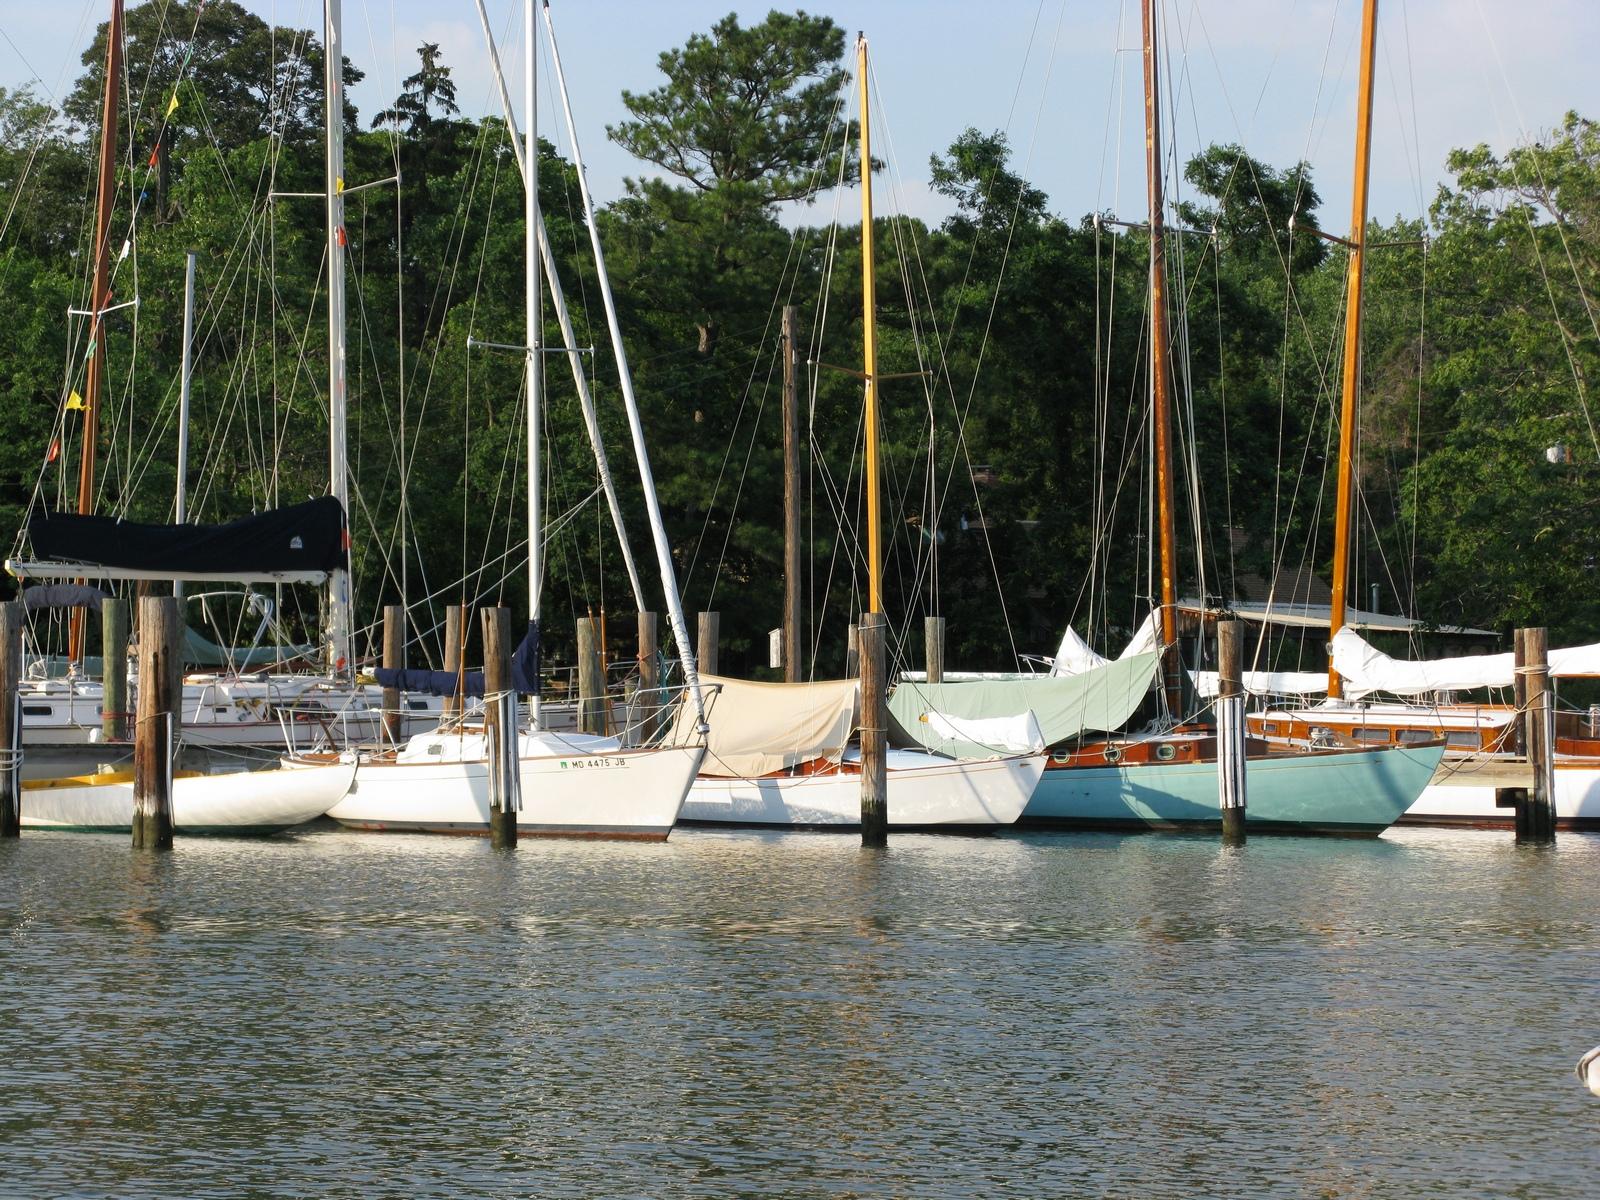 Hinckley_Yard_Yachts_1600x1200.jpg